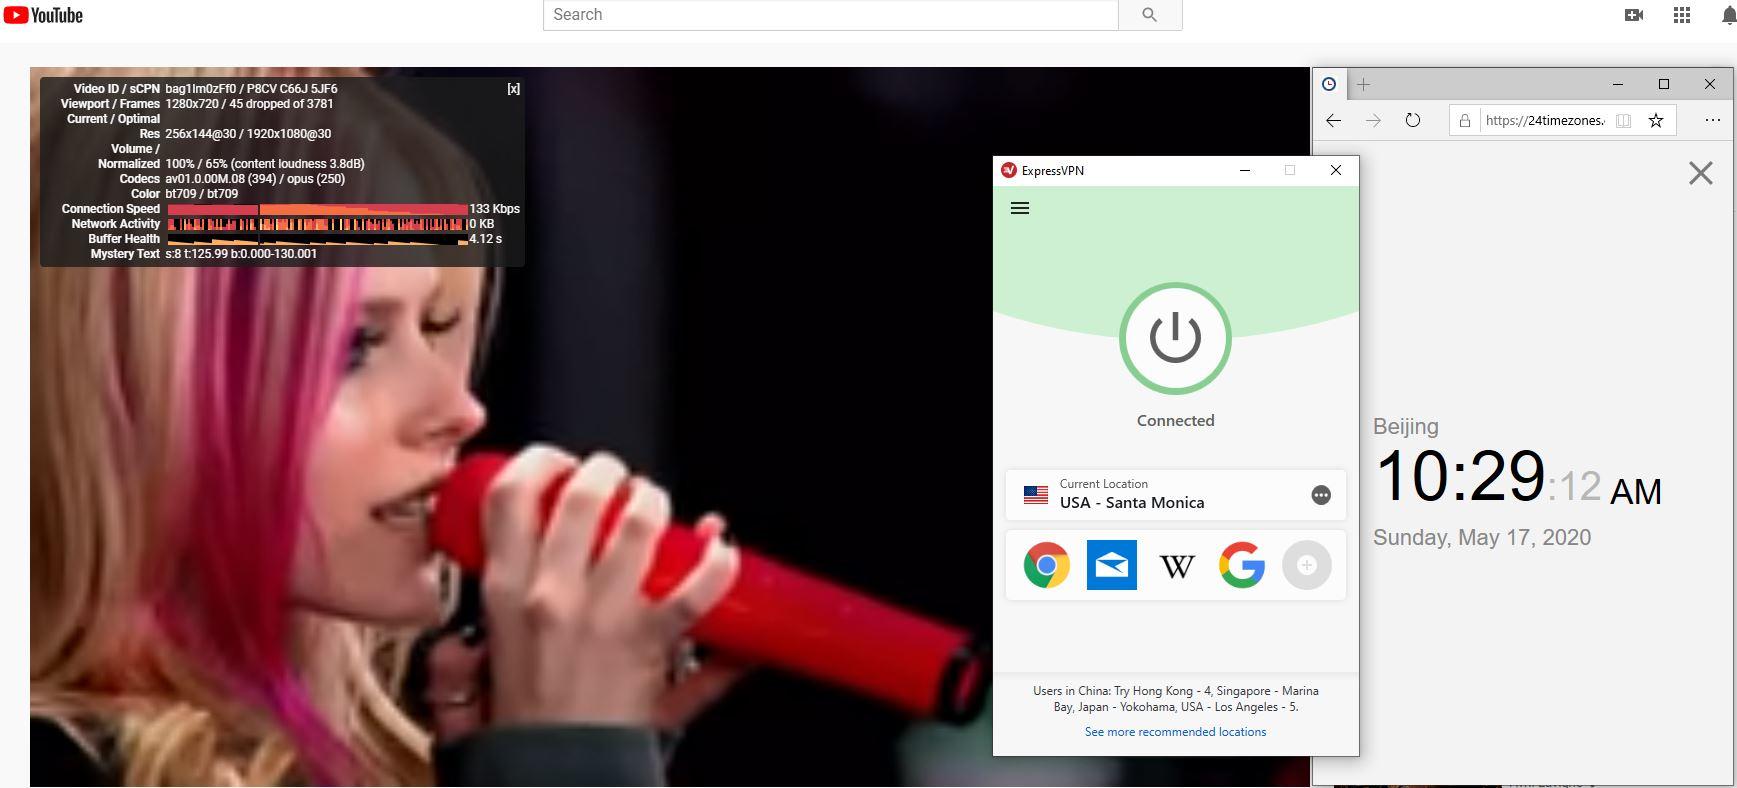 Windows10 ExpressVPN USA -Santa Monica 中国VPN 翻墙 科学上网 youtube测速-20200517